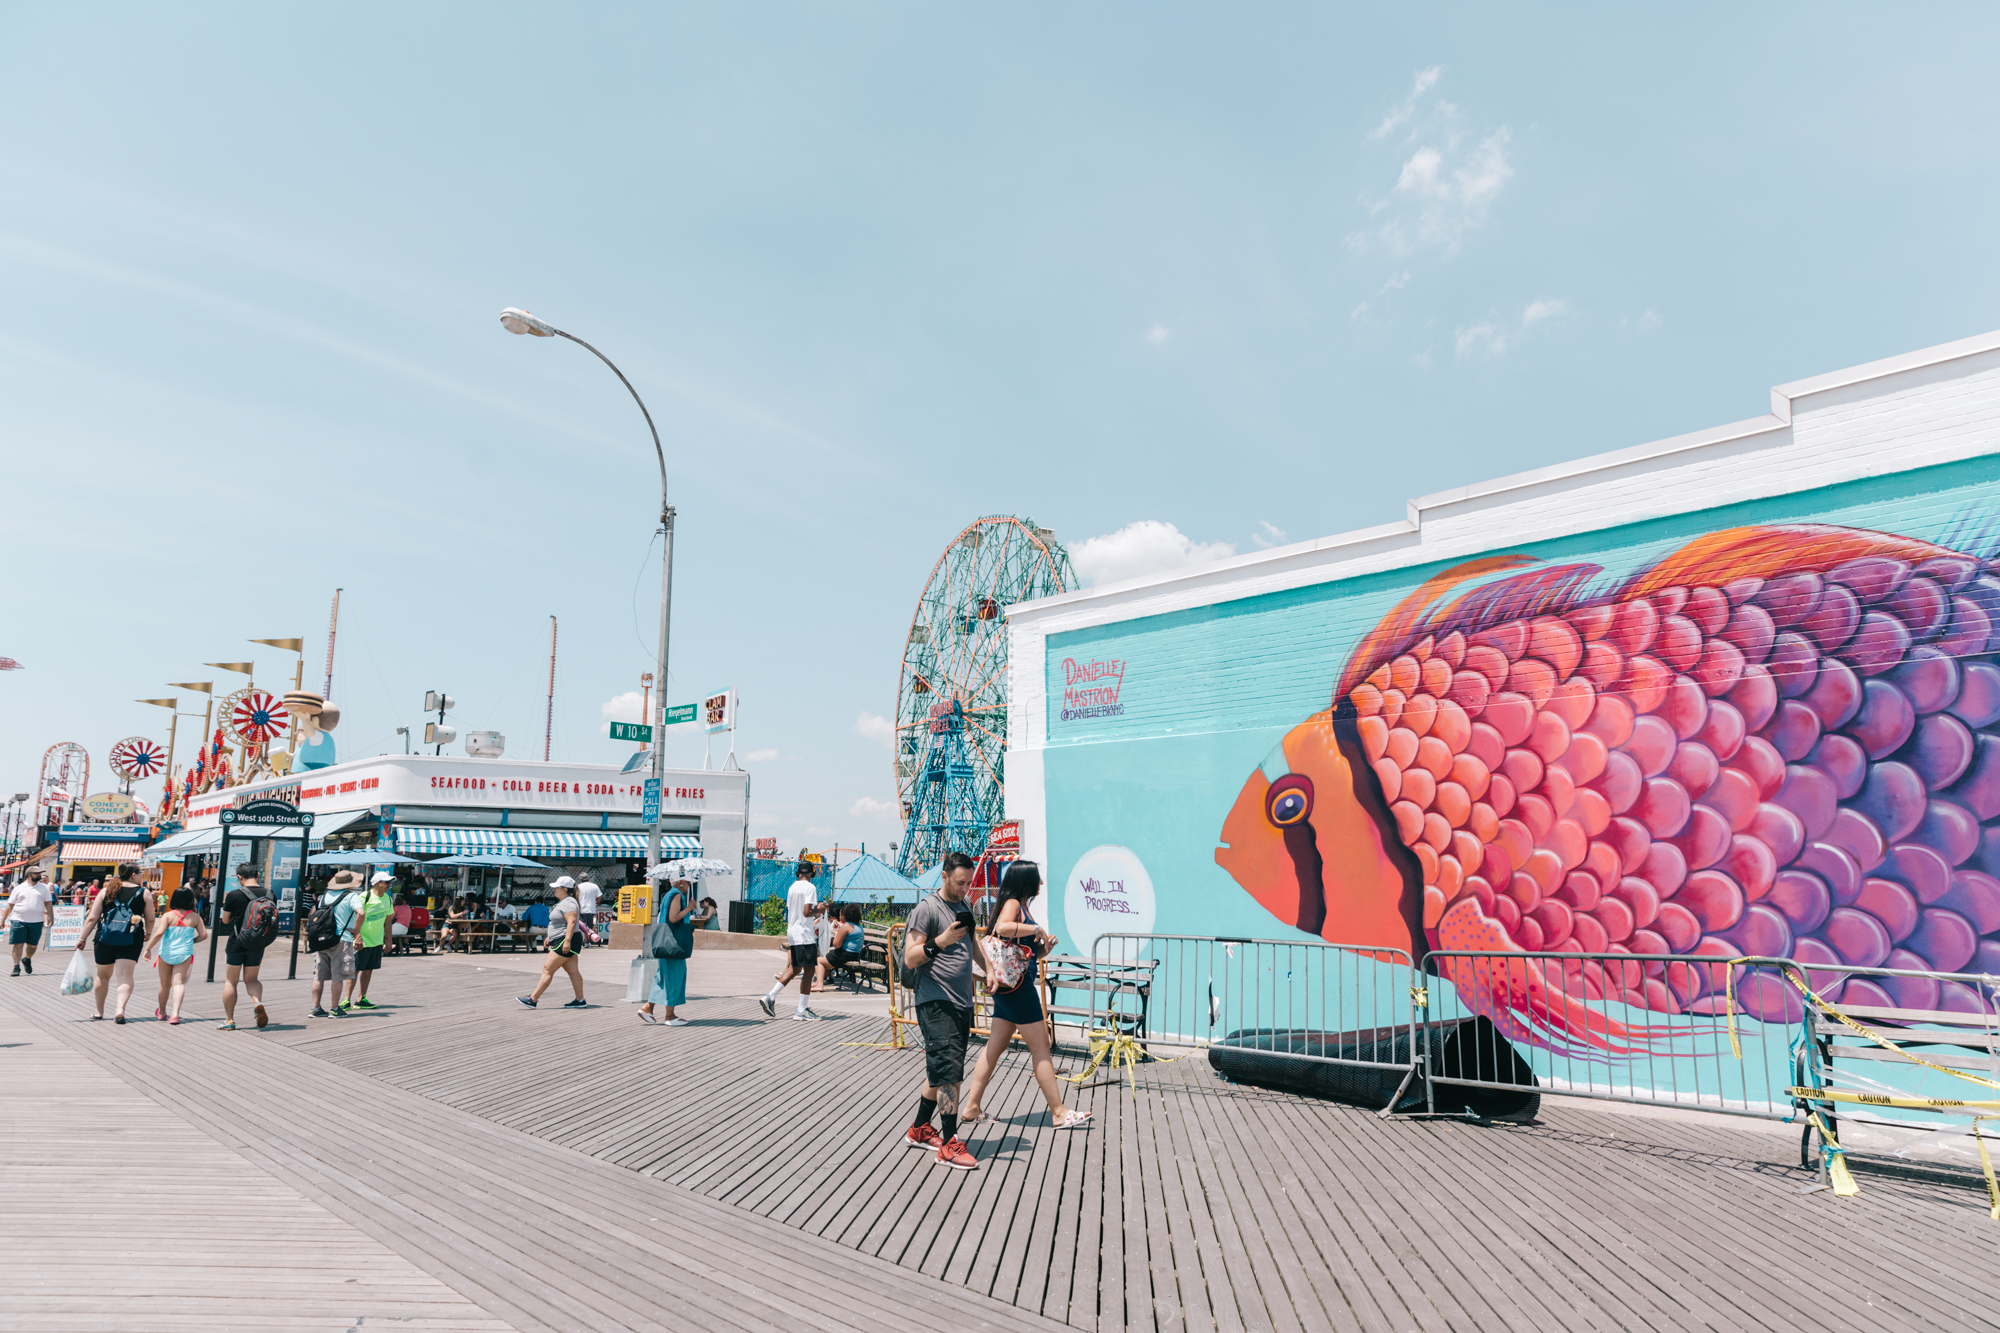 Coney_Island_NYC_4thJuly_DaniellePhotographySA36.jpg